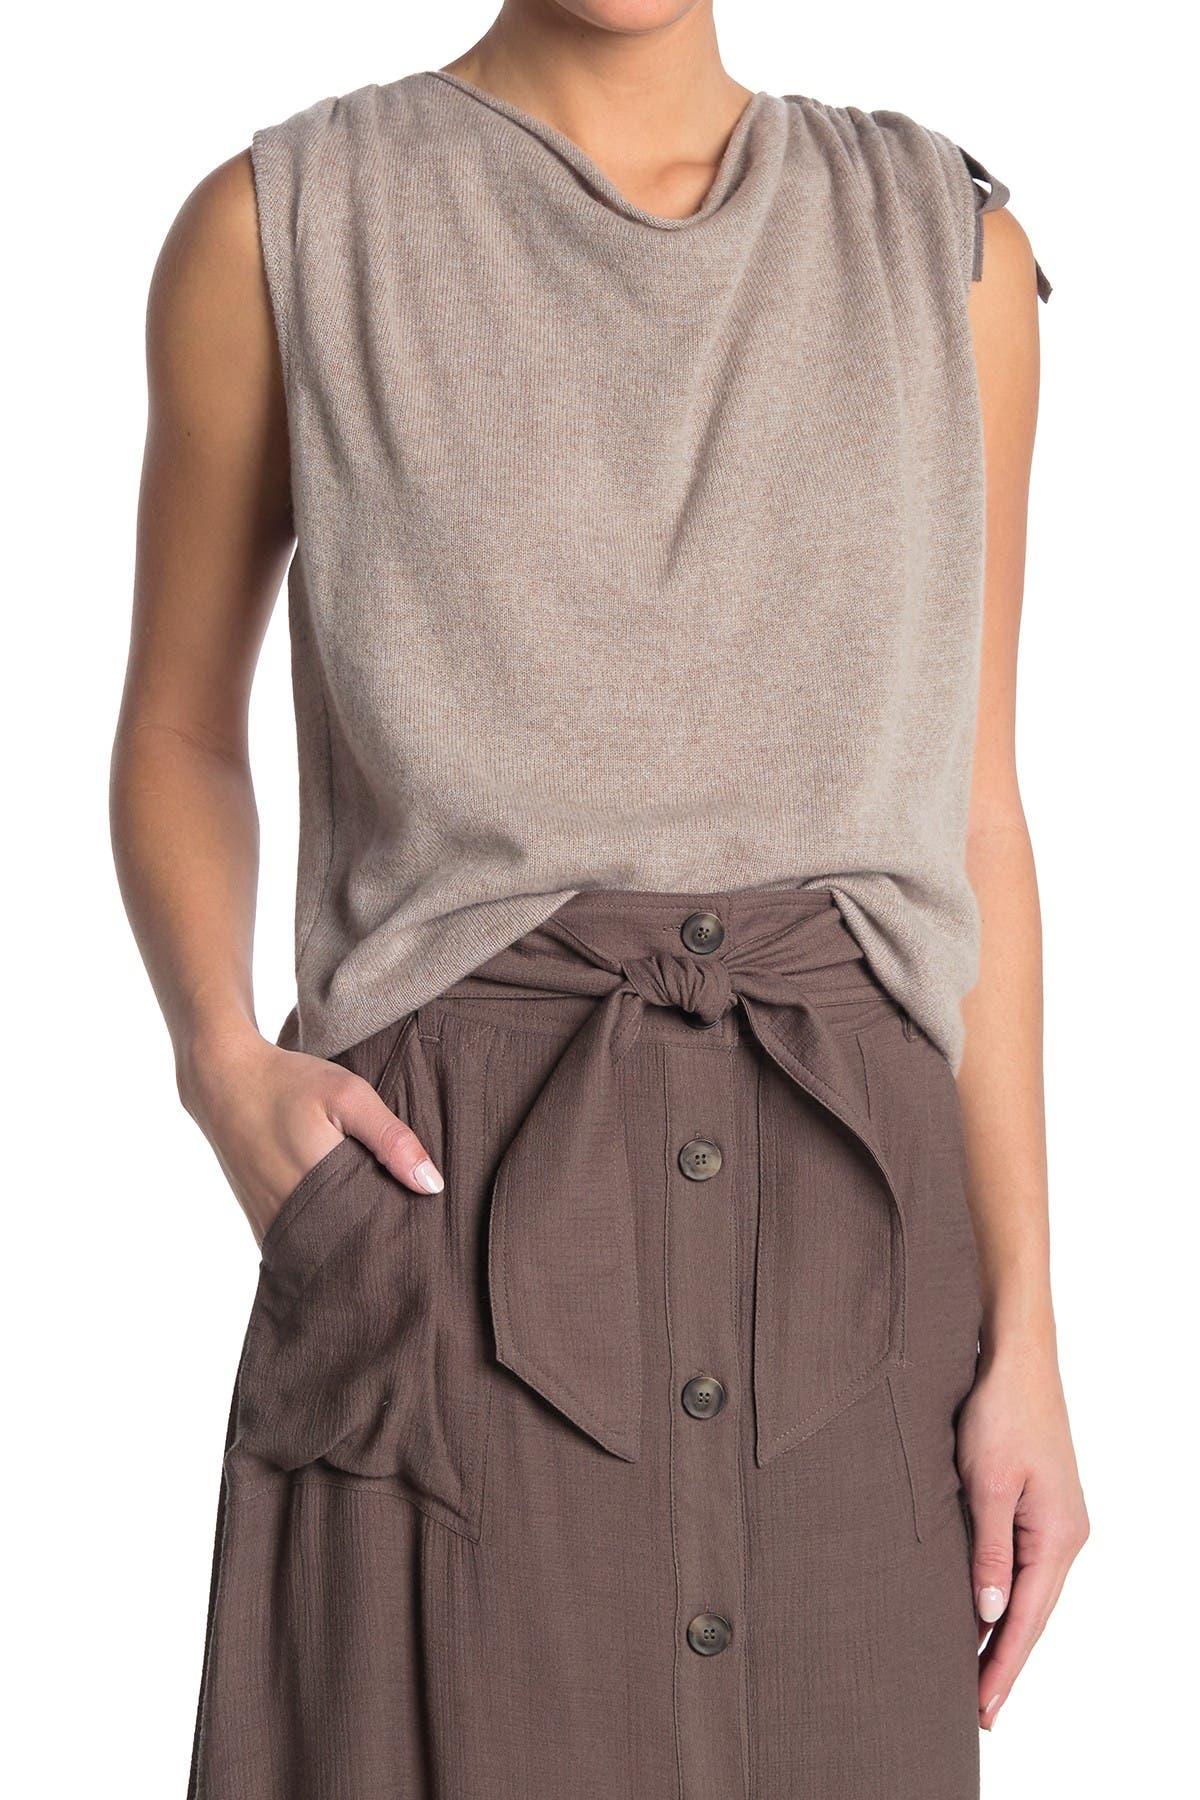 Image of Brochu Walker Vos Cashmere Twist Top